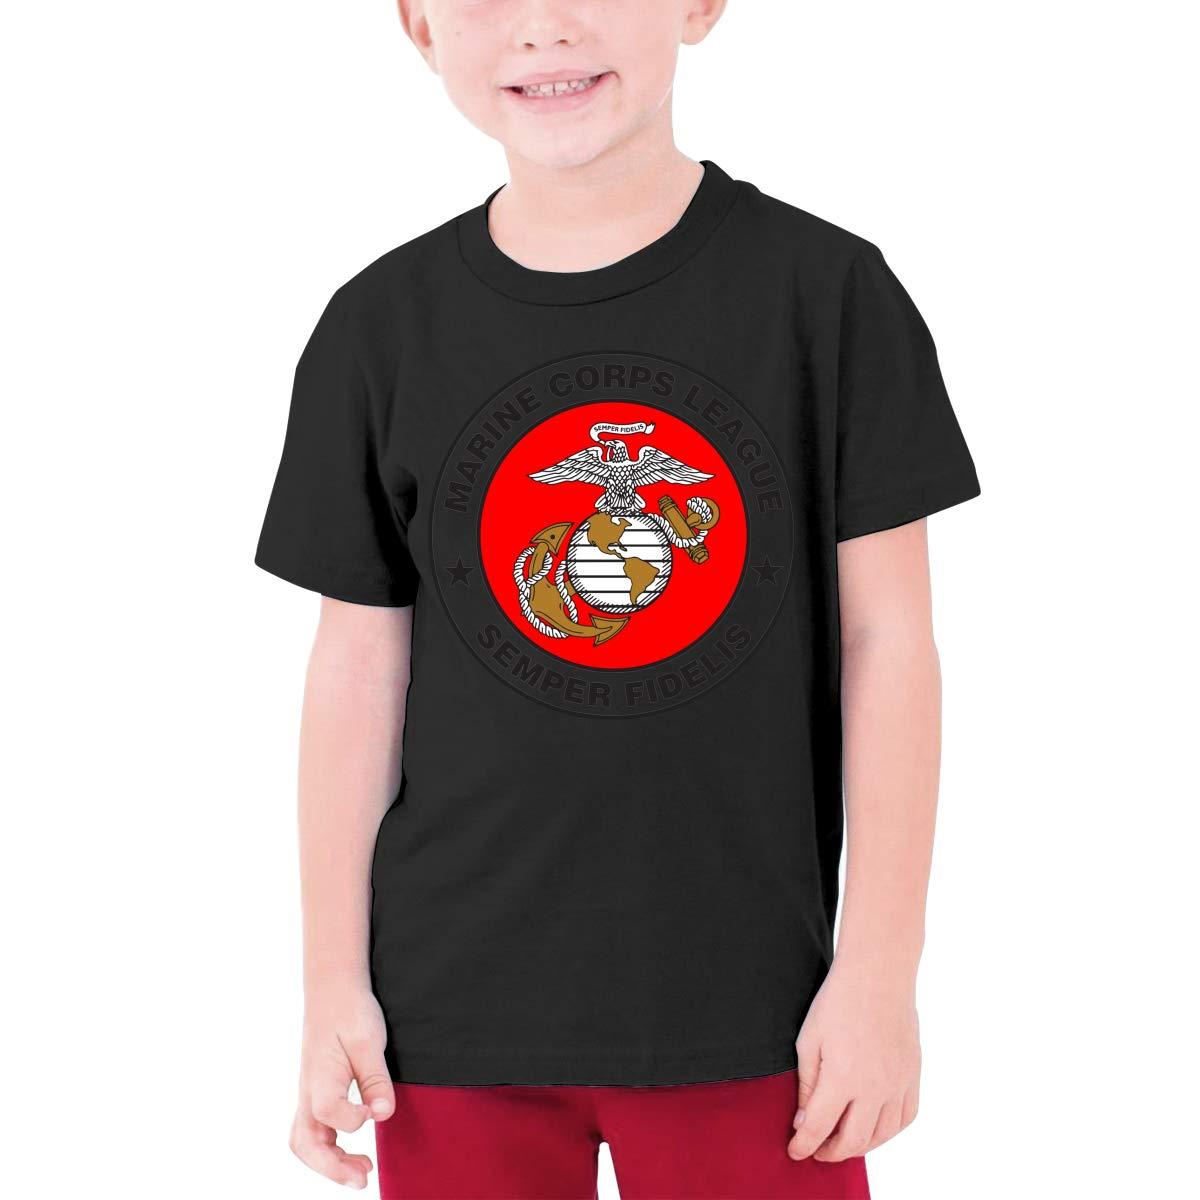 EROTEN Marine Corps League Logo Cotton Youth T Shirts Short Sleeve for Teenager Boys Girls